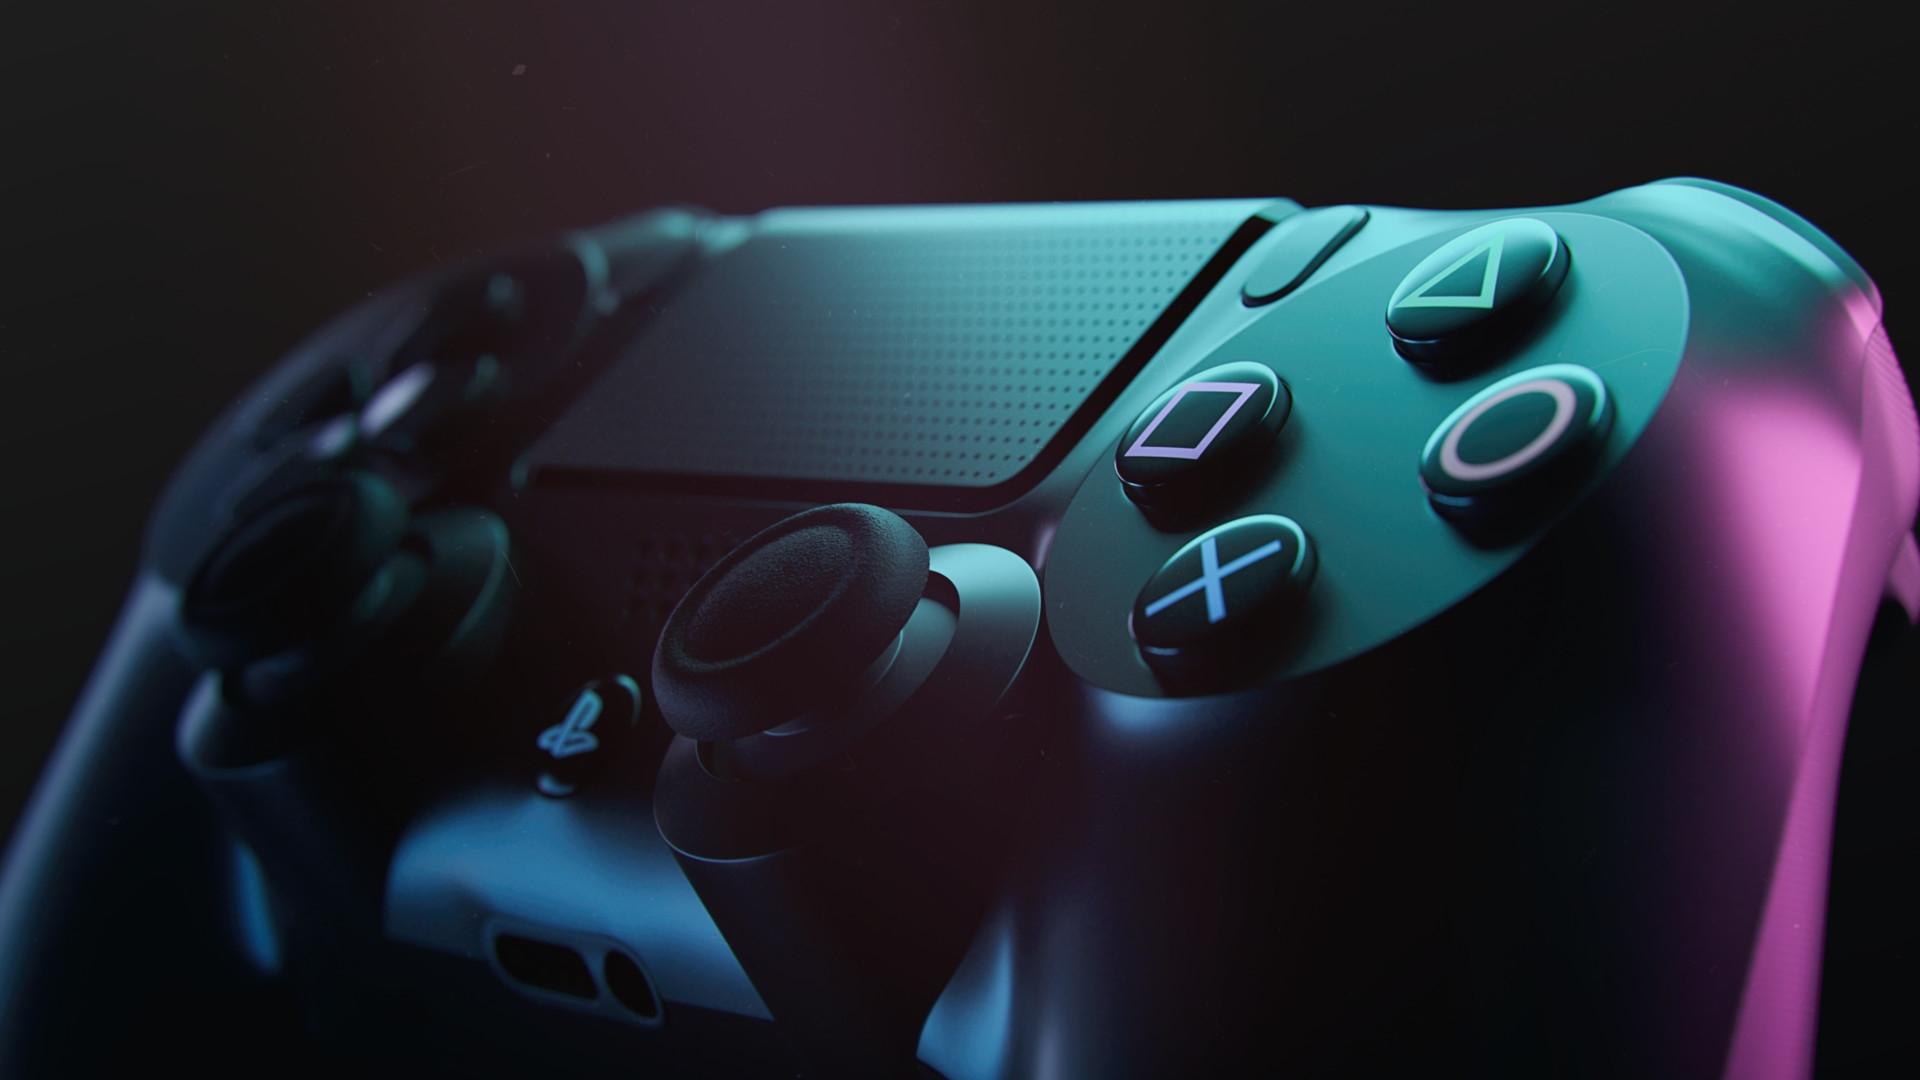 Самые продаваемы игры на PS4 за 2020 год